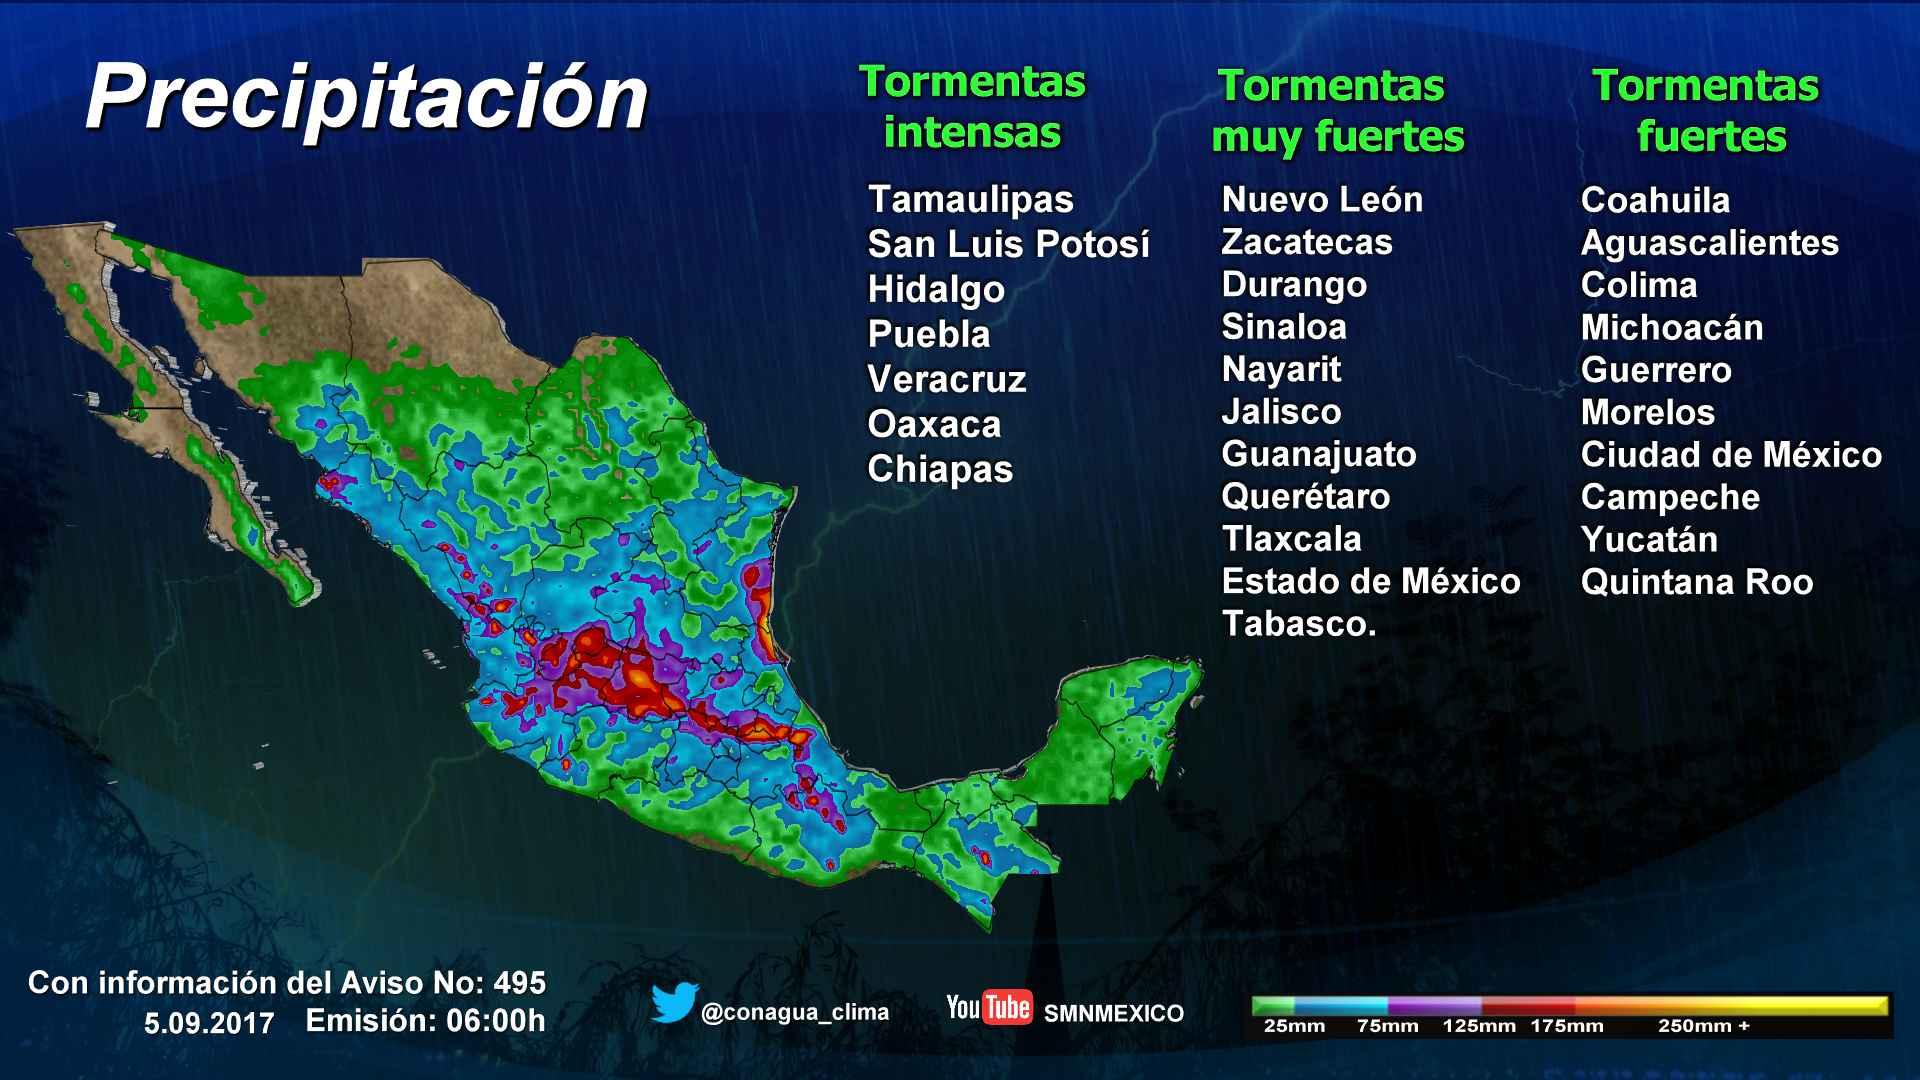 Se pronostican tormentas muy fuertes para Tlaxcala